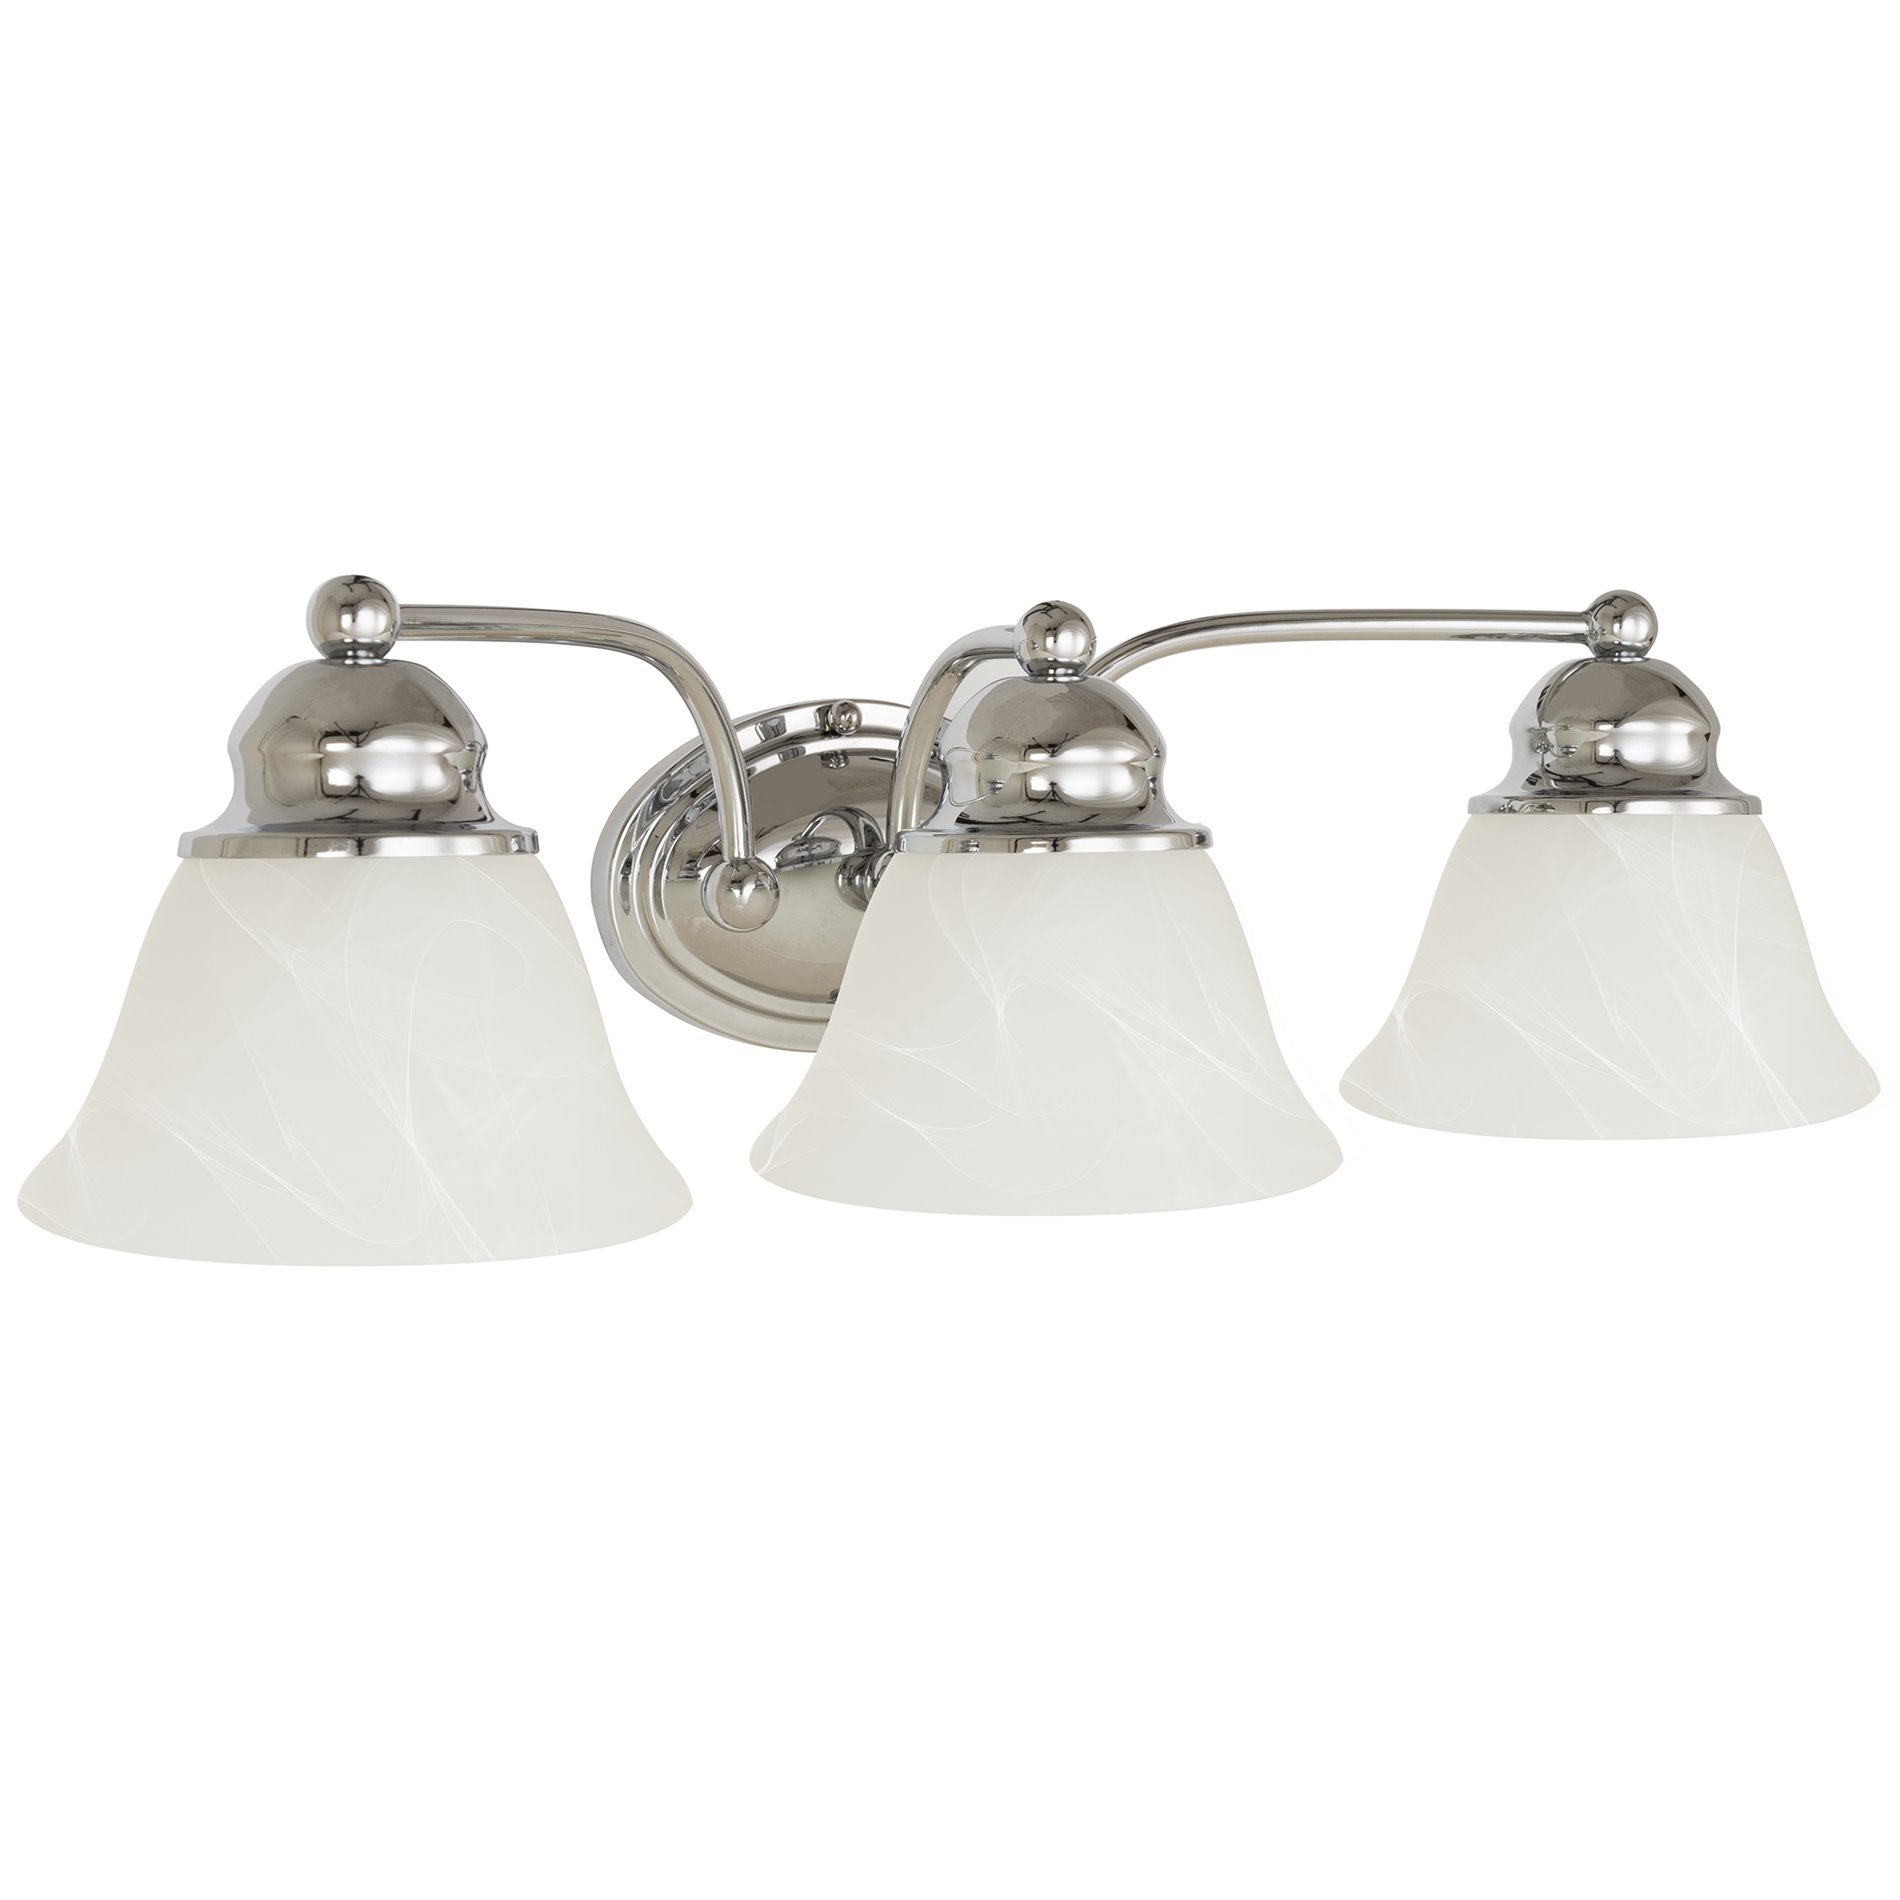 Revel/Kira Home Carlisle 21'' 3-Light Vanity/Bathroom Light with Alabaster Glass, Polished Chrome